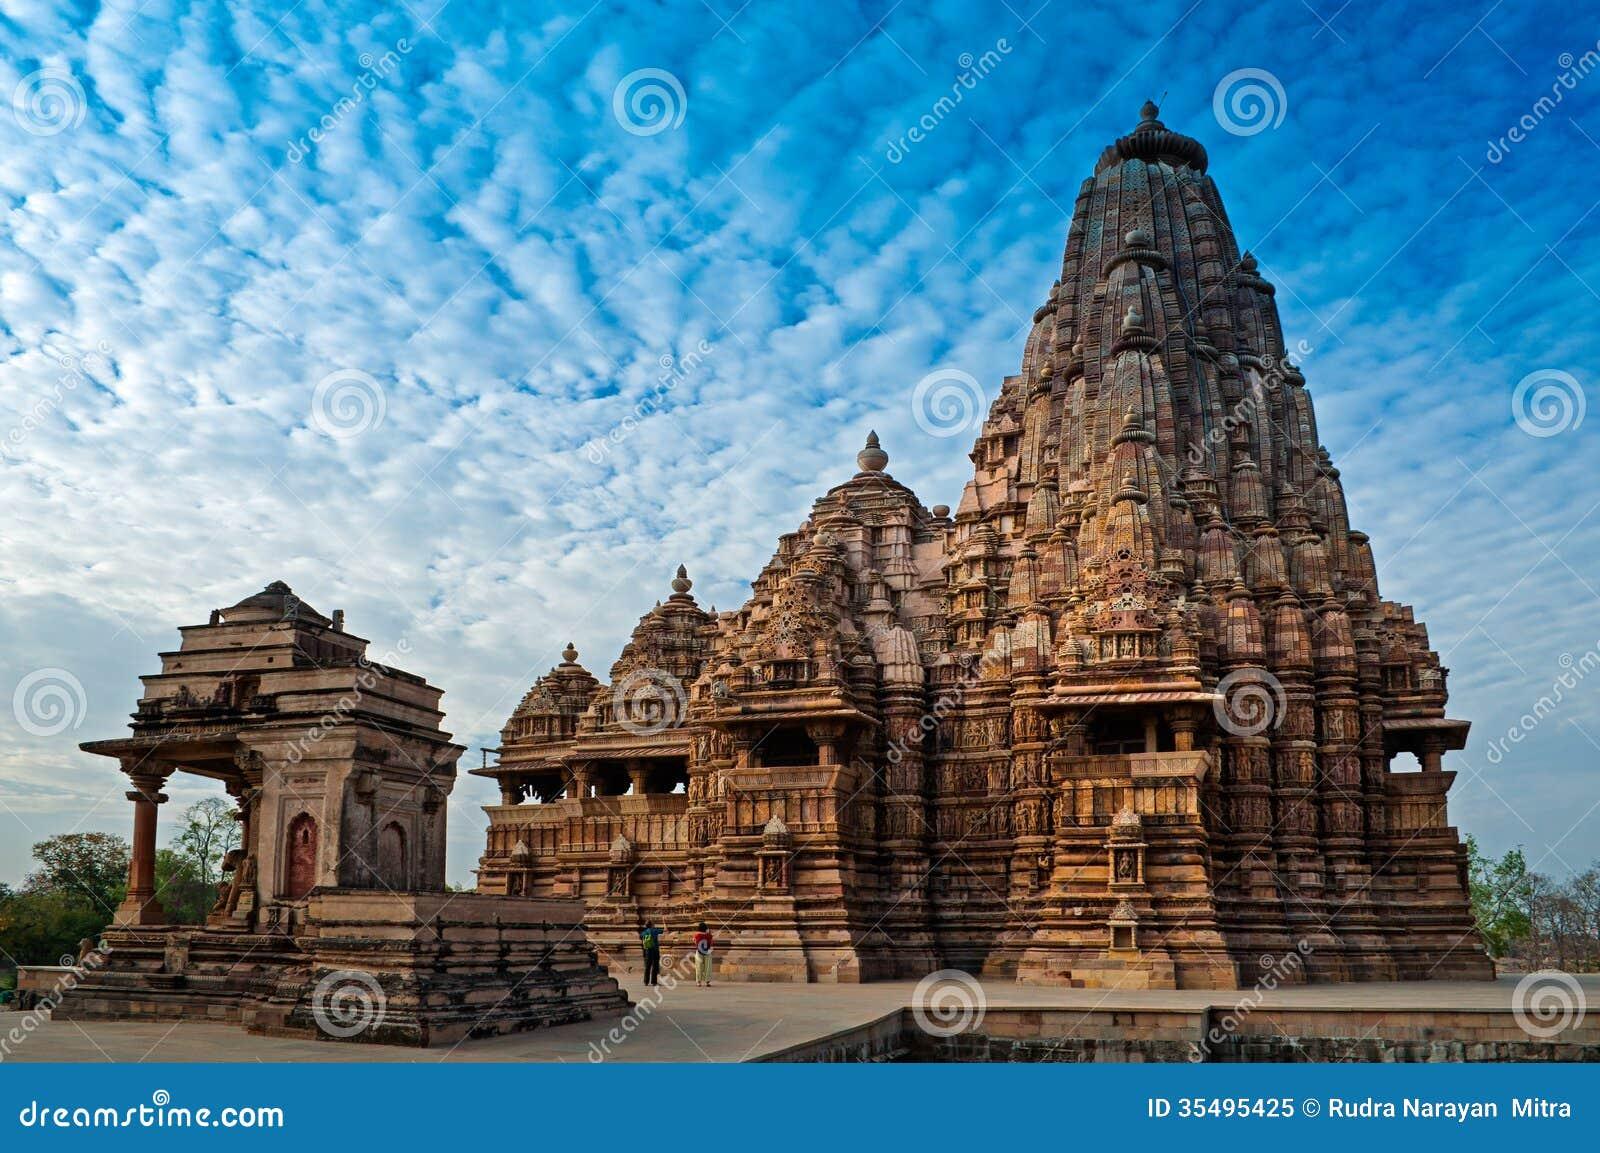 De Tempel van Kandariyamahadeva, Khajuraho, India, Unesco-erfenisplaats